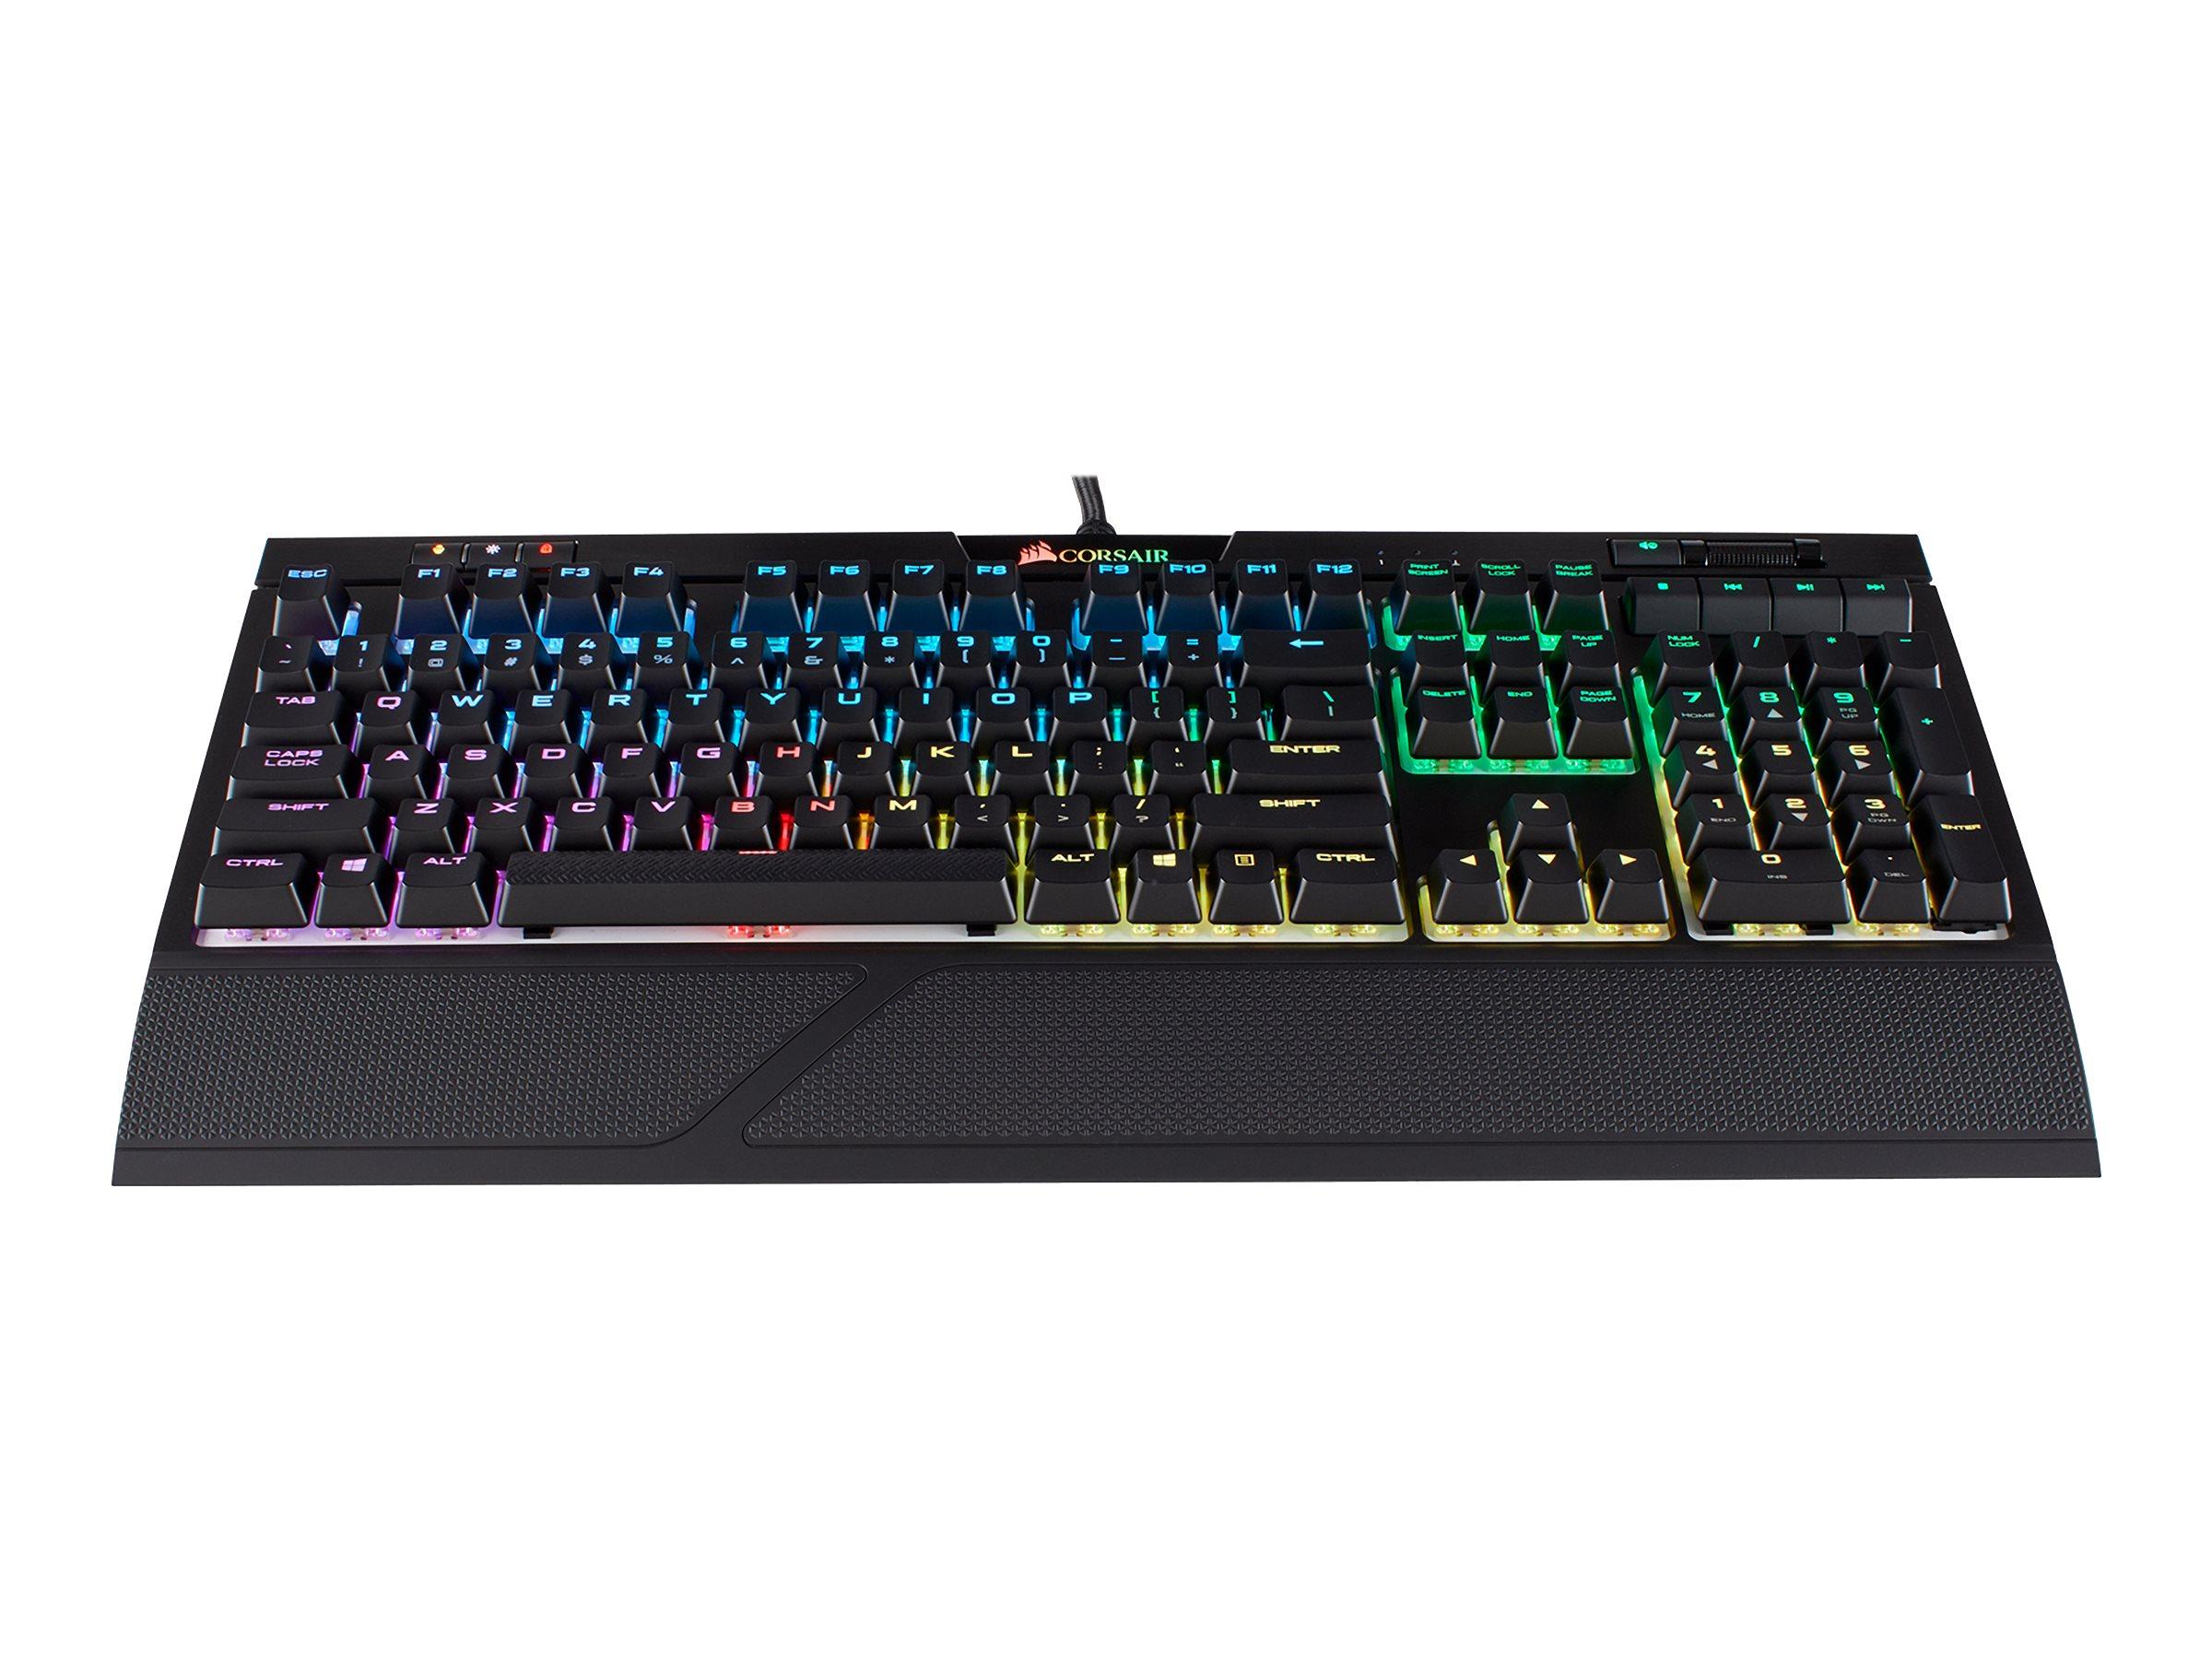 DCS Kabel tastatur Logitech Pro Mechanical Gaming